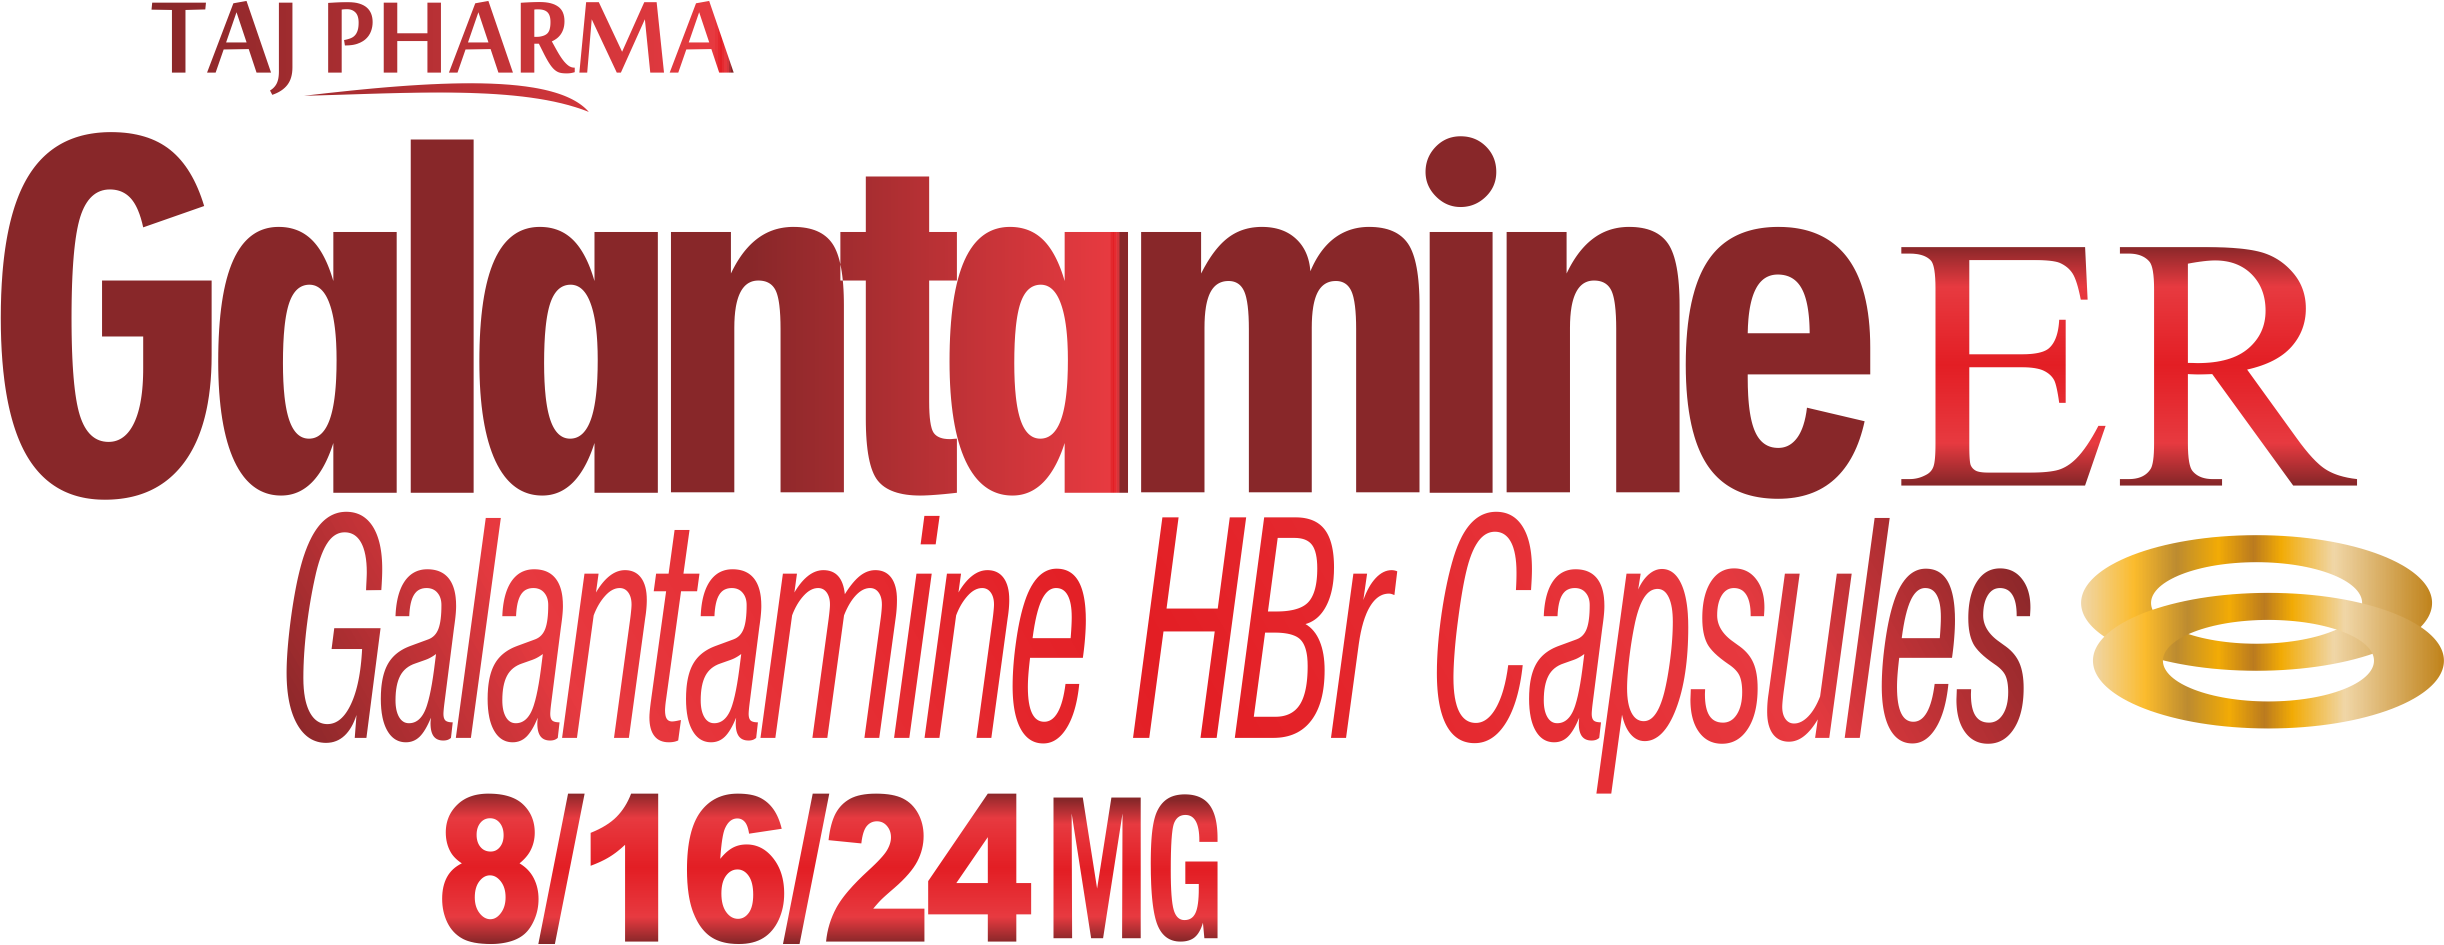 Galantamine extended-release capsules - Taj Pharma